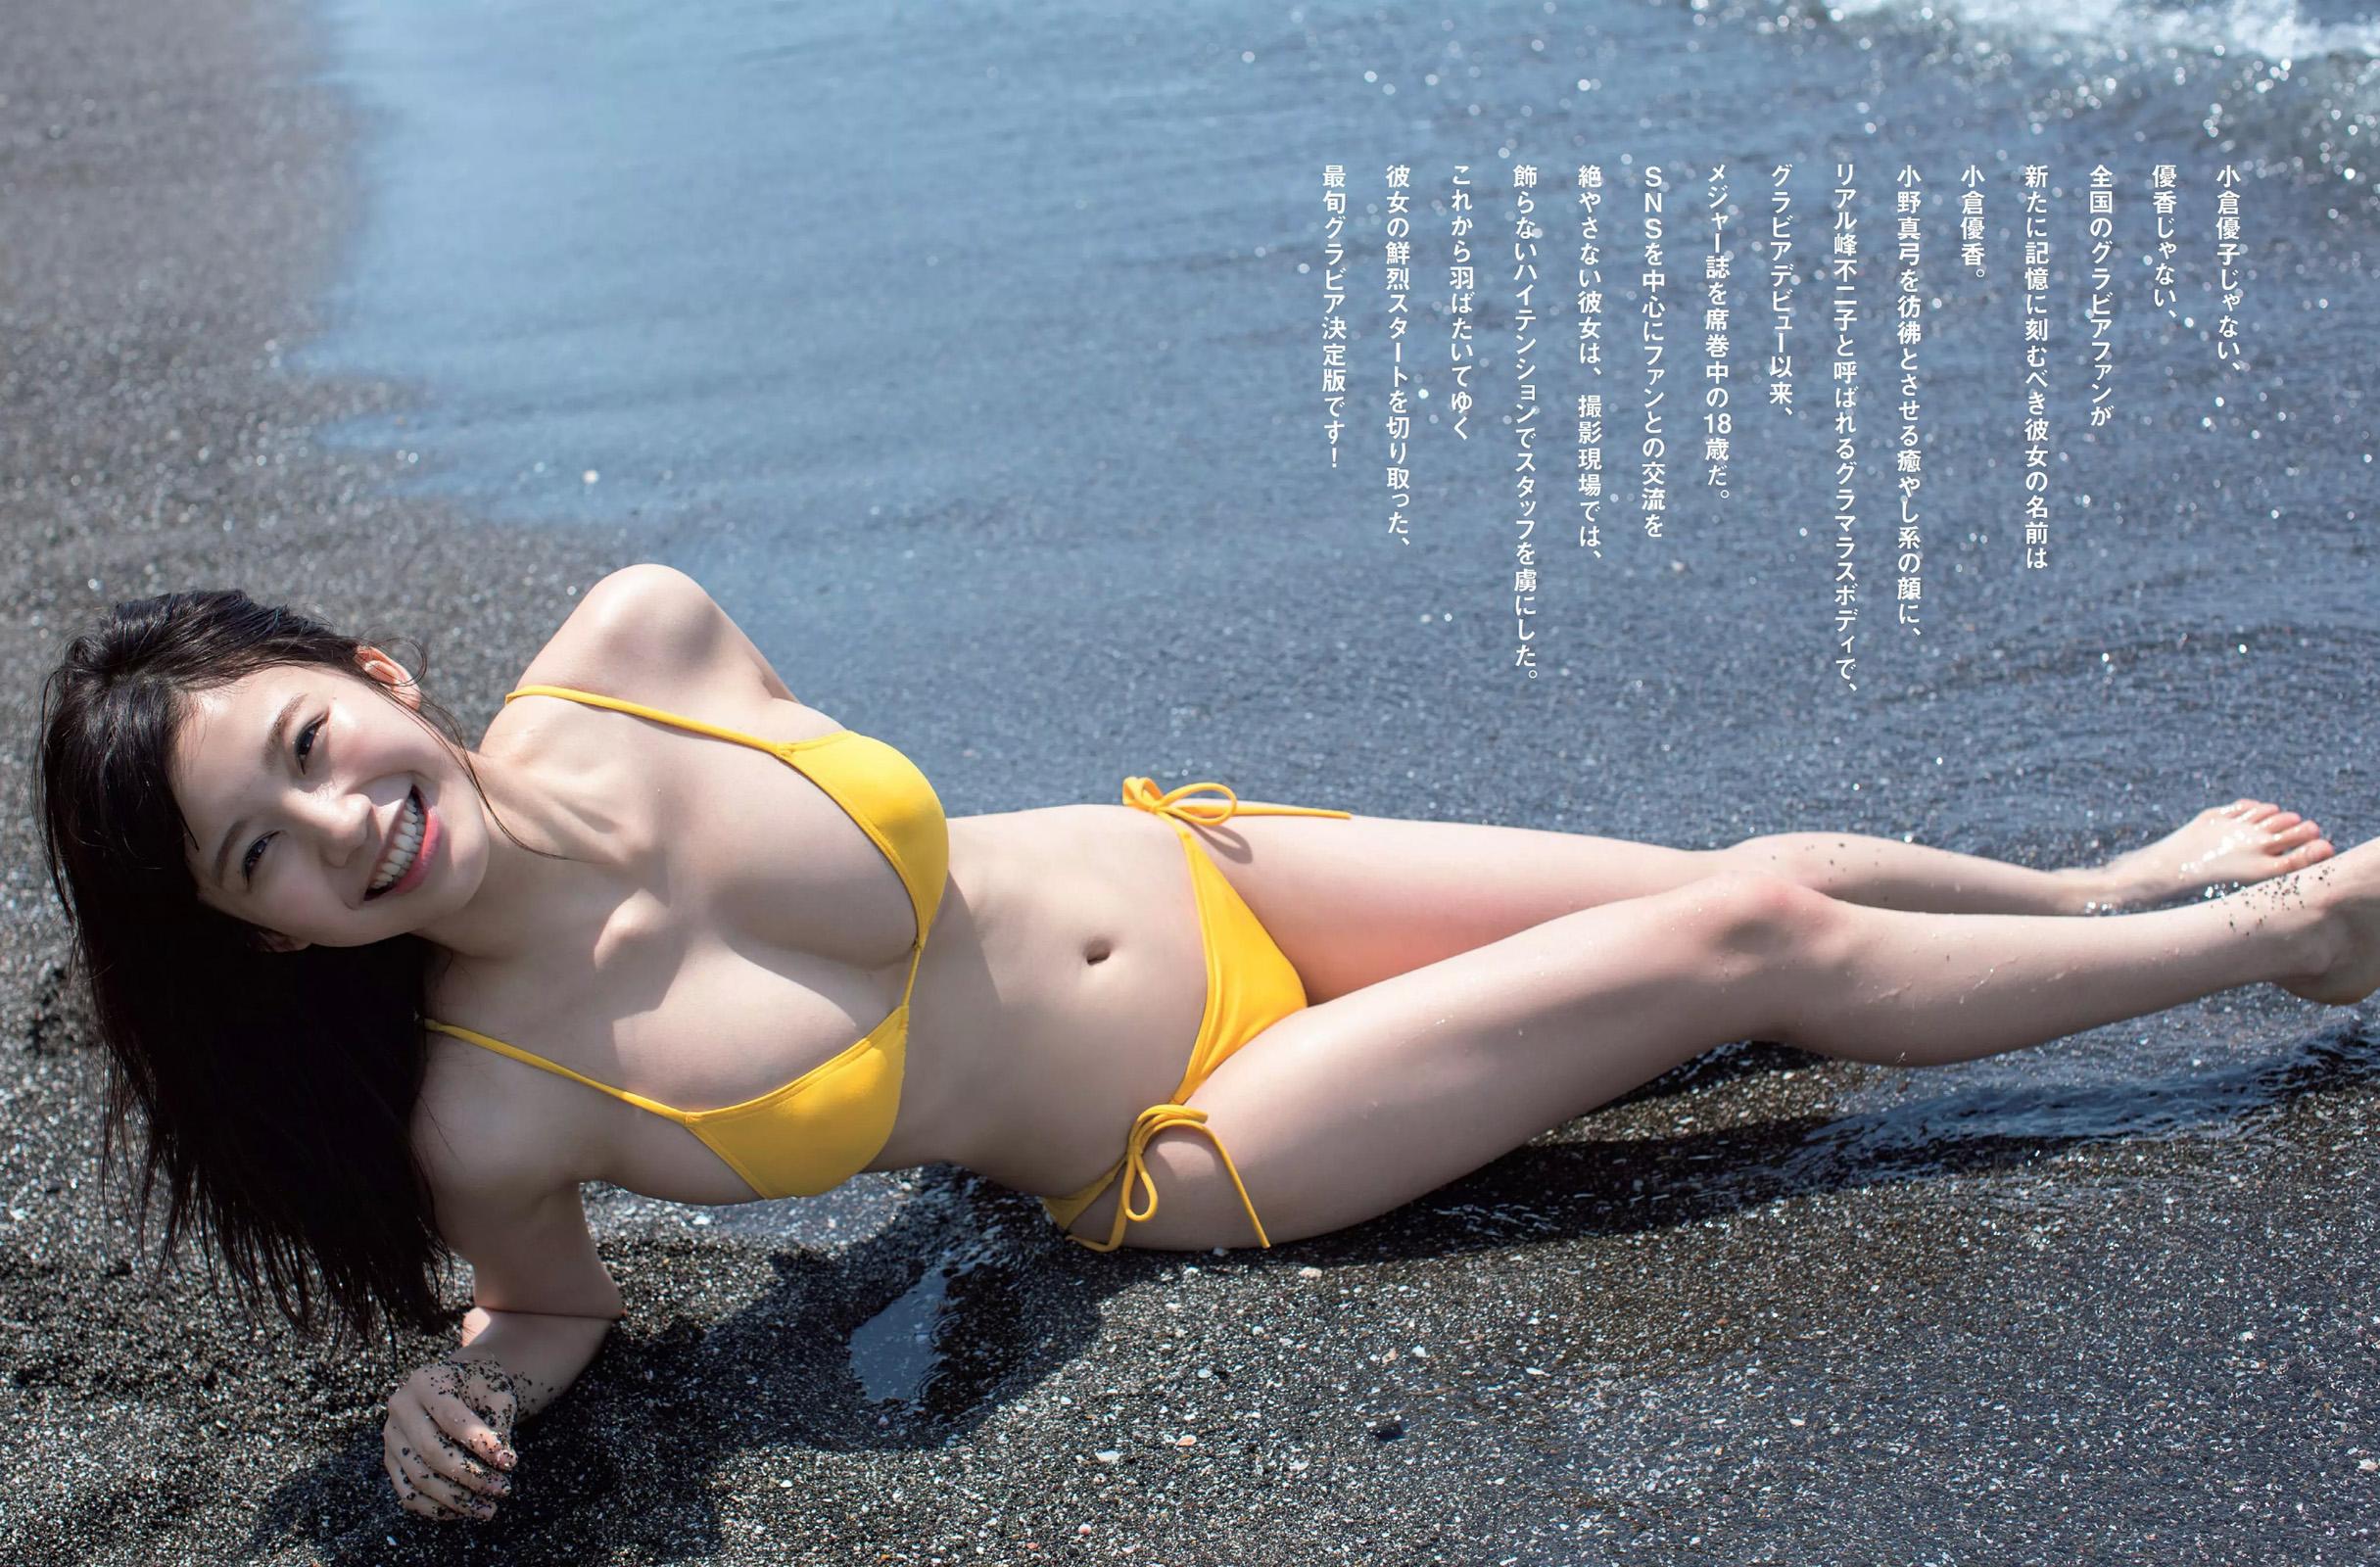 [FLASH 電子版] 2017 No.07.25 Ogura Yuka   Akari Yoshida   Ryoko Mima   other